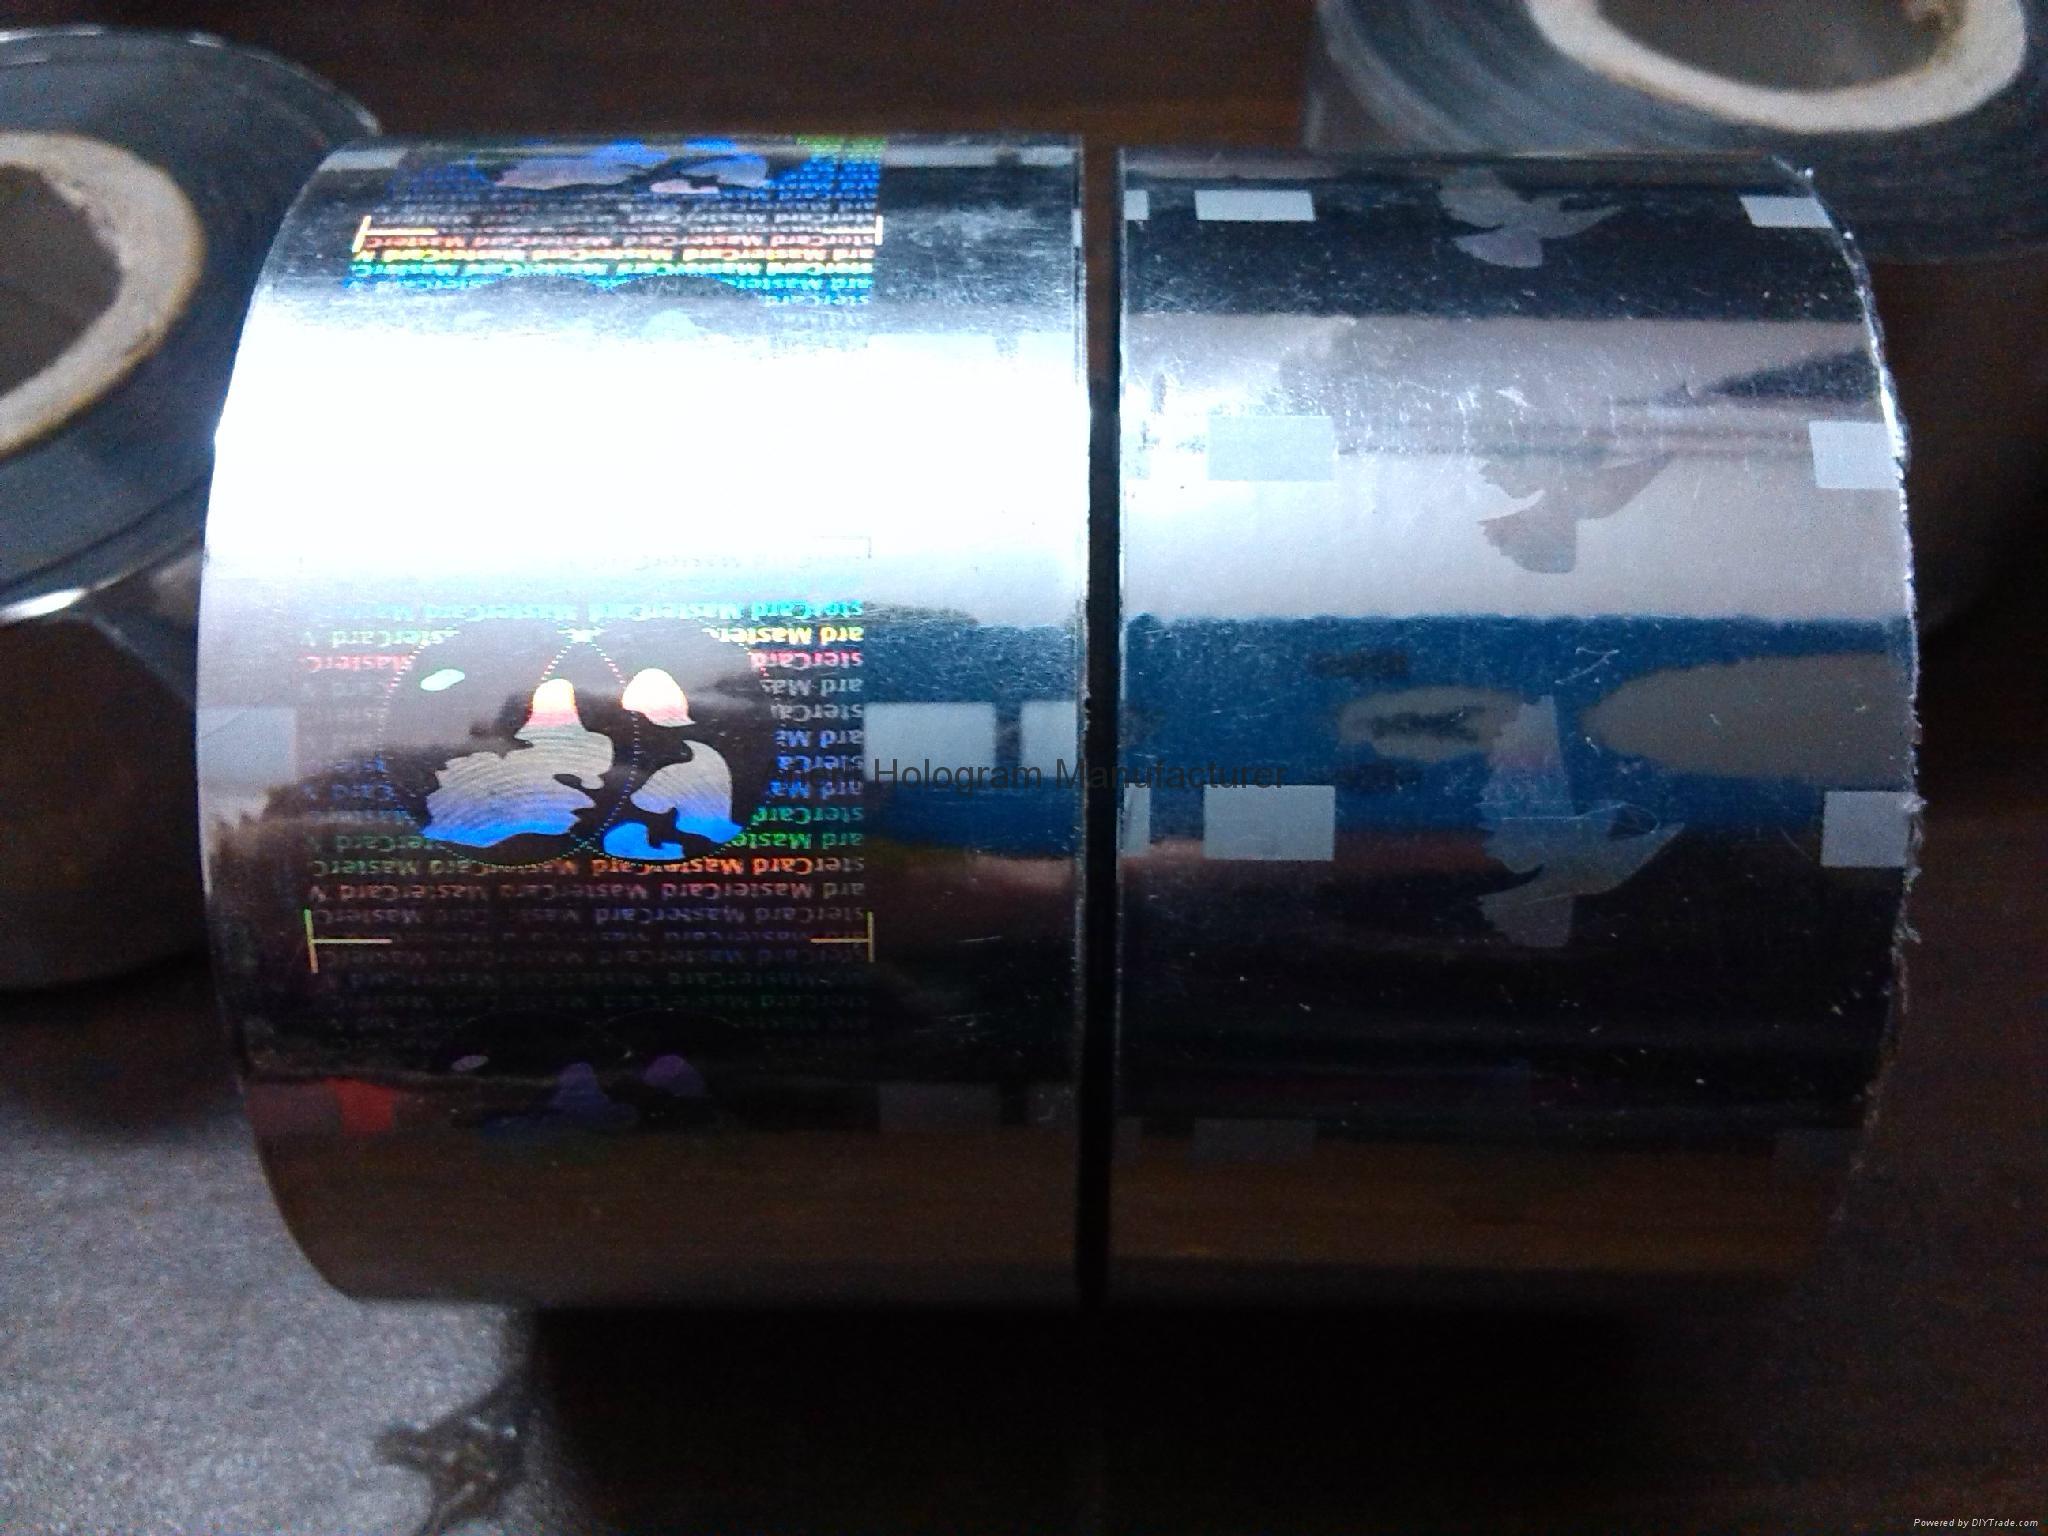 Hot stamping heat press mastercard hologram